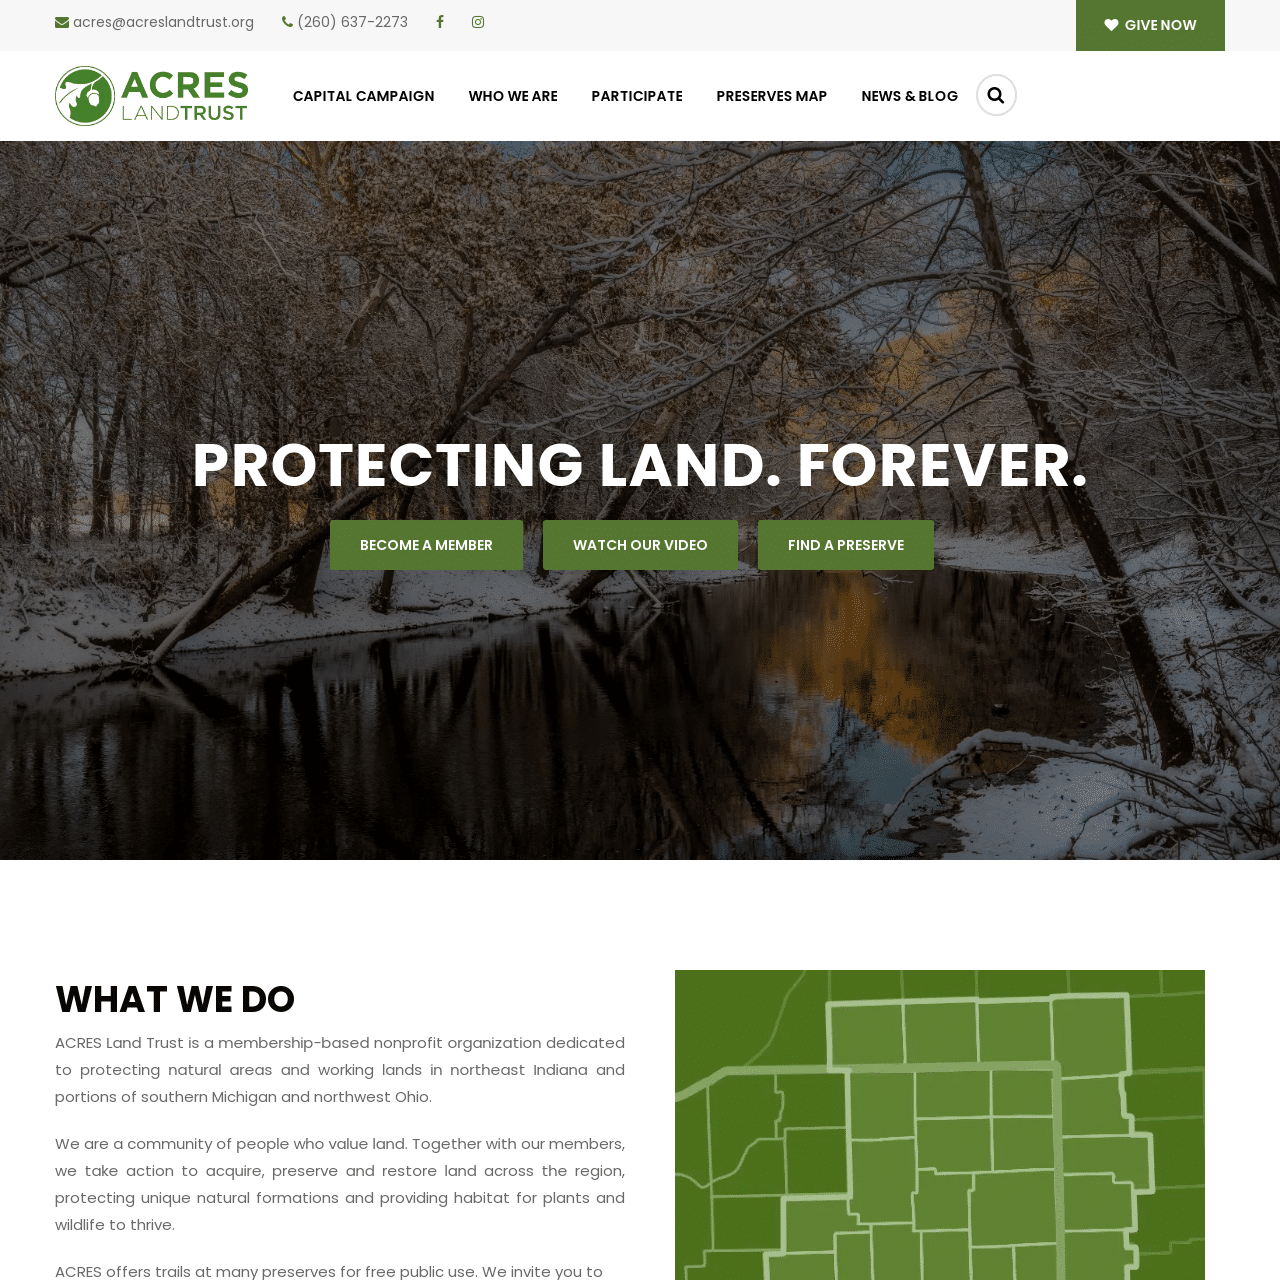 ACRES Land Trust снимок экрана